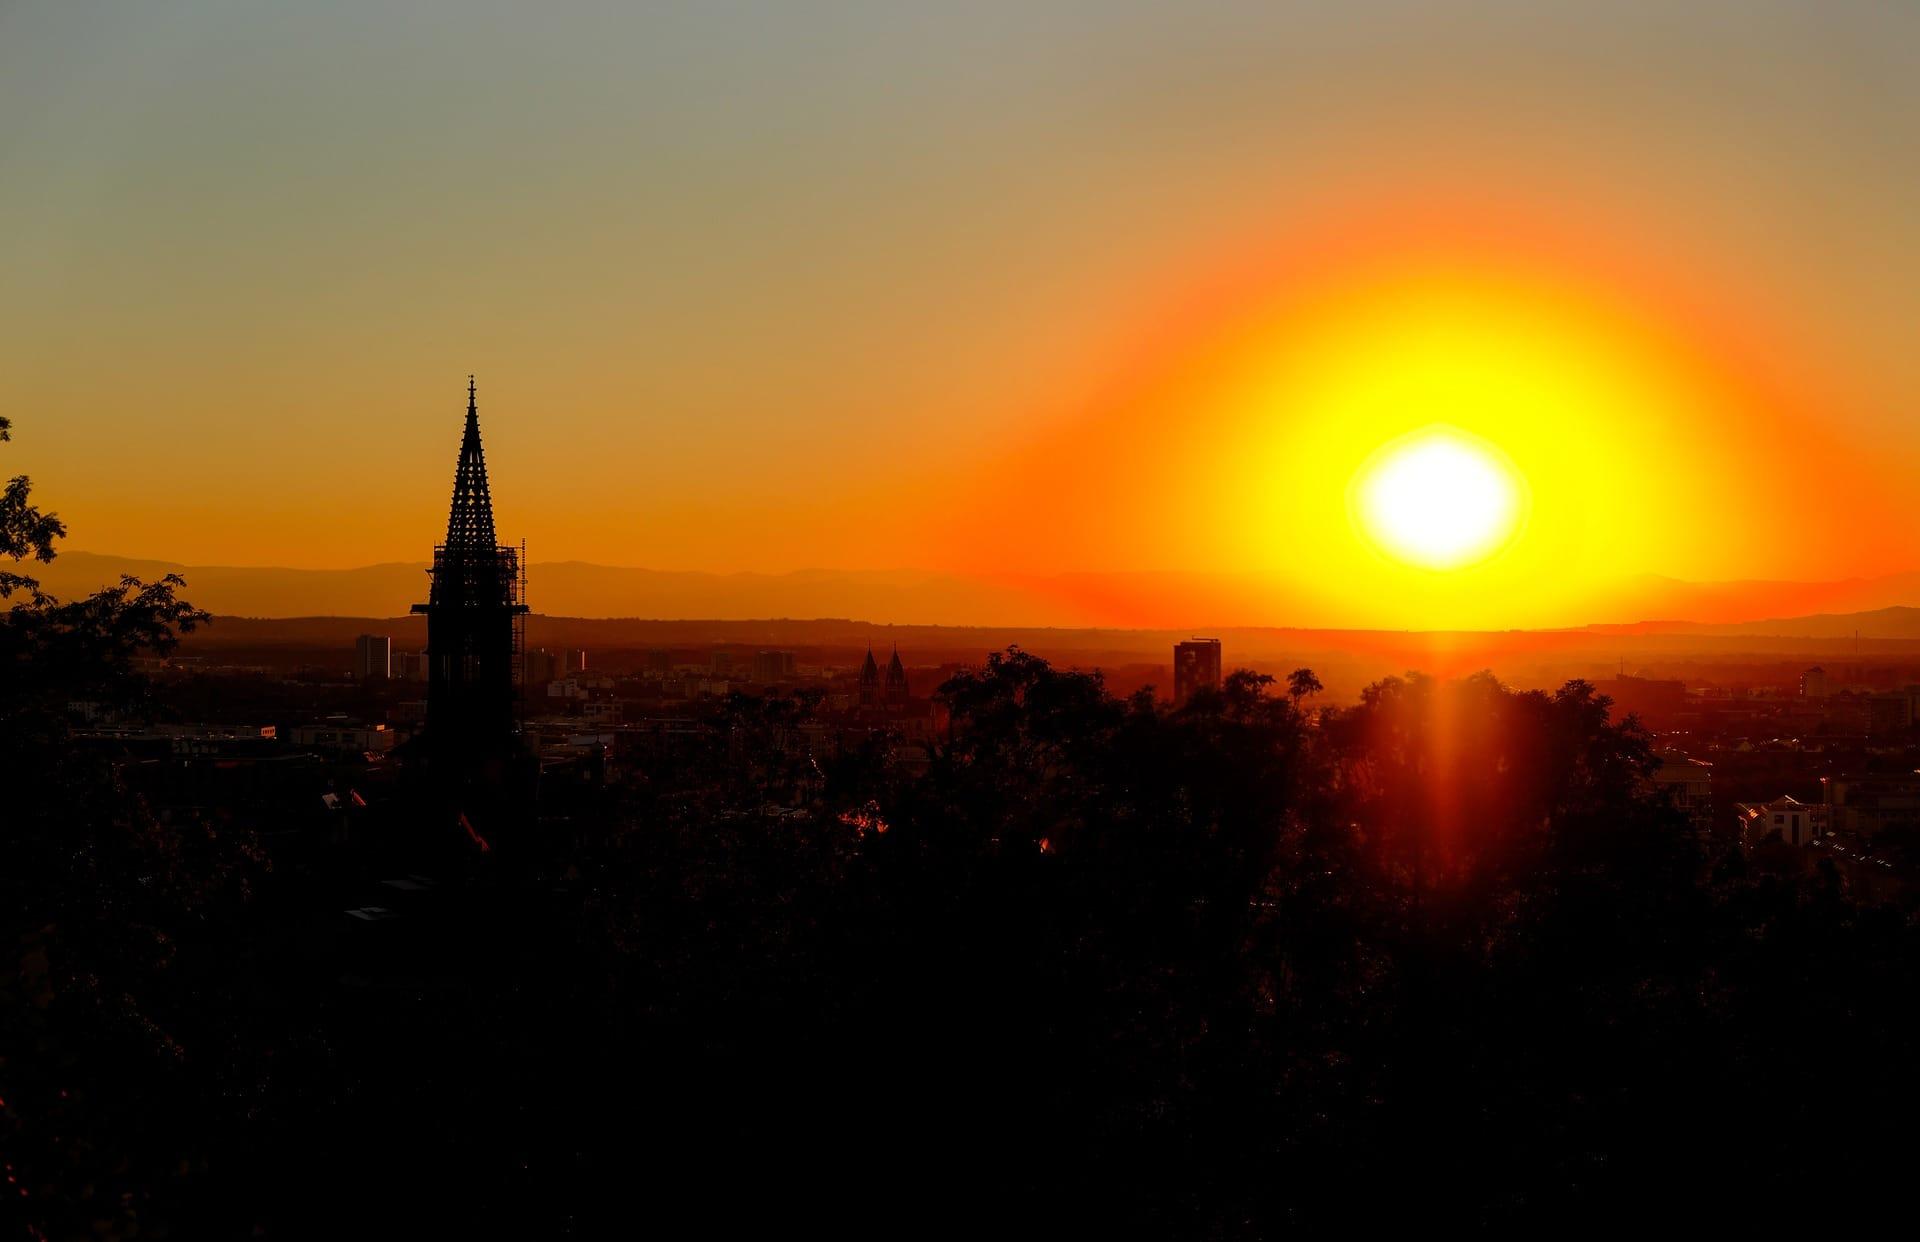 sunset-1618257_1920